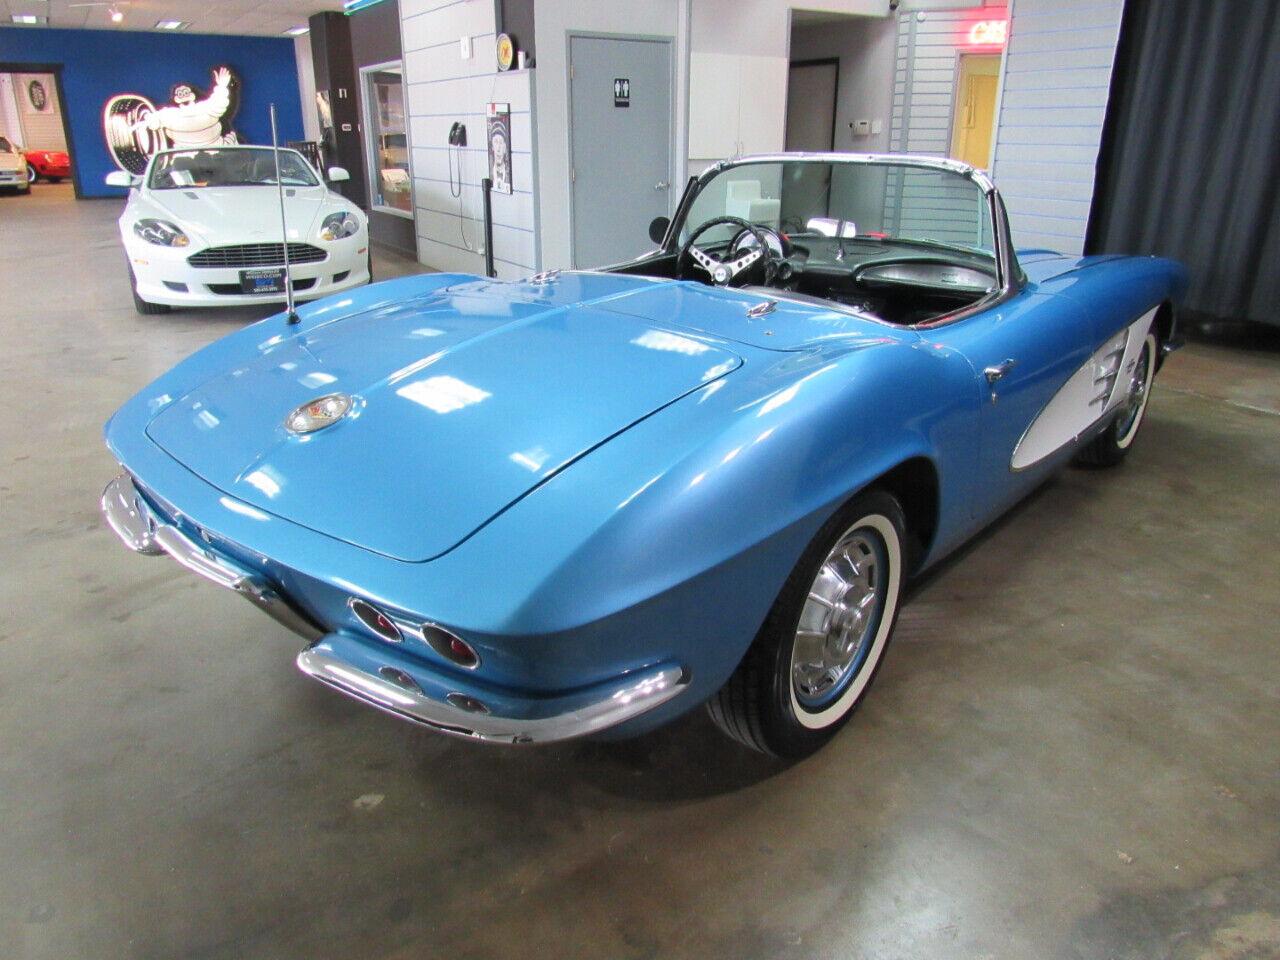 1961 Blue Chevrolet Corvette   | C1 Corvette Photo 6